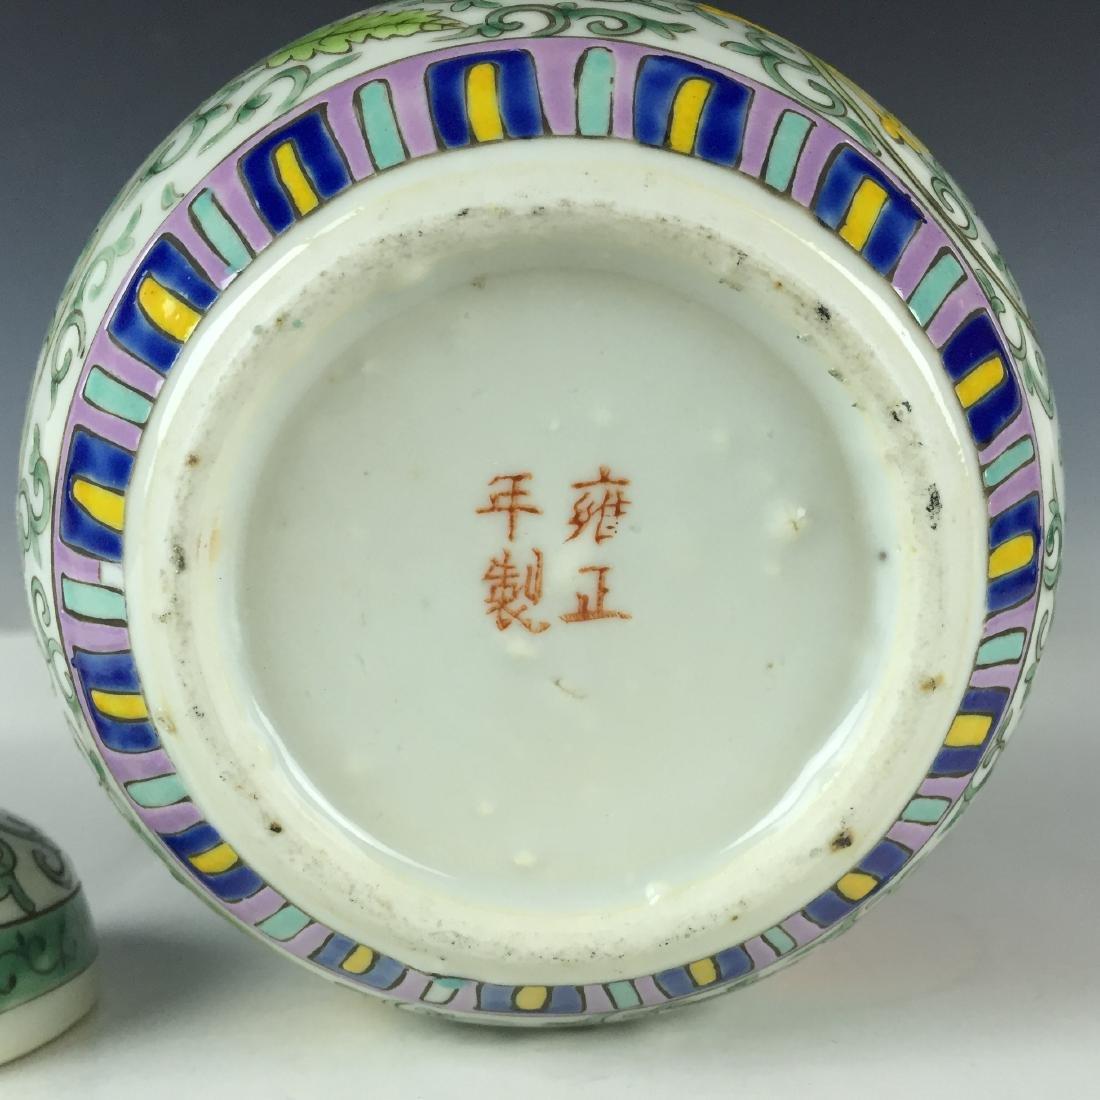 Vintage Porcelain Jar with YongZheng Mark, 18th/19th - 3